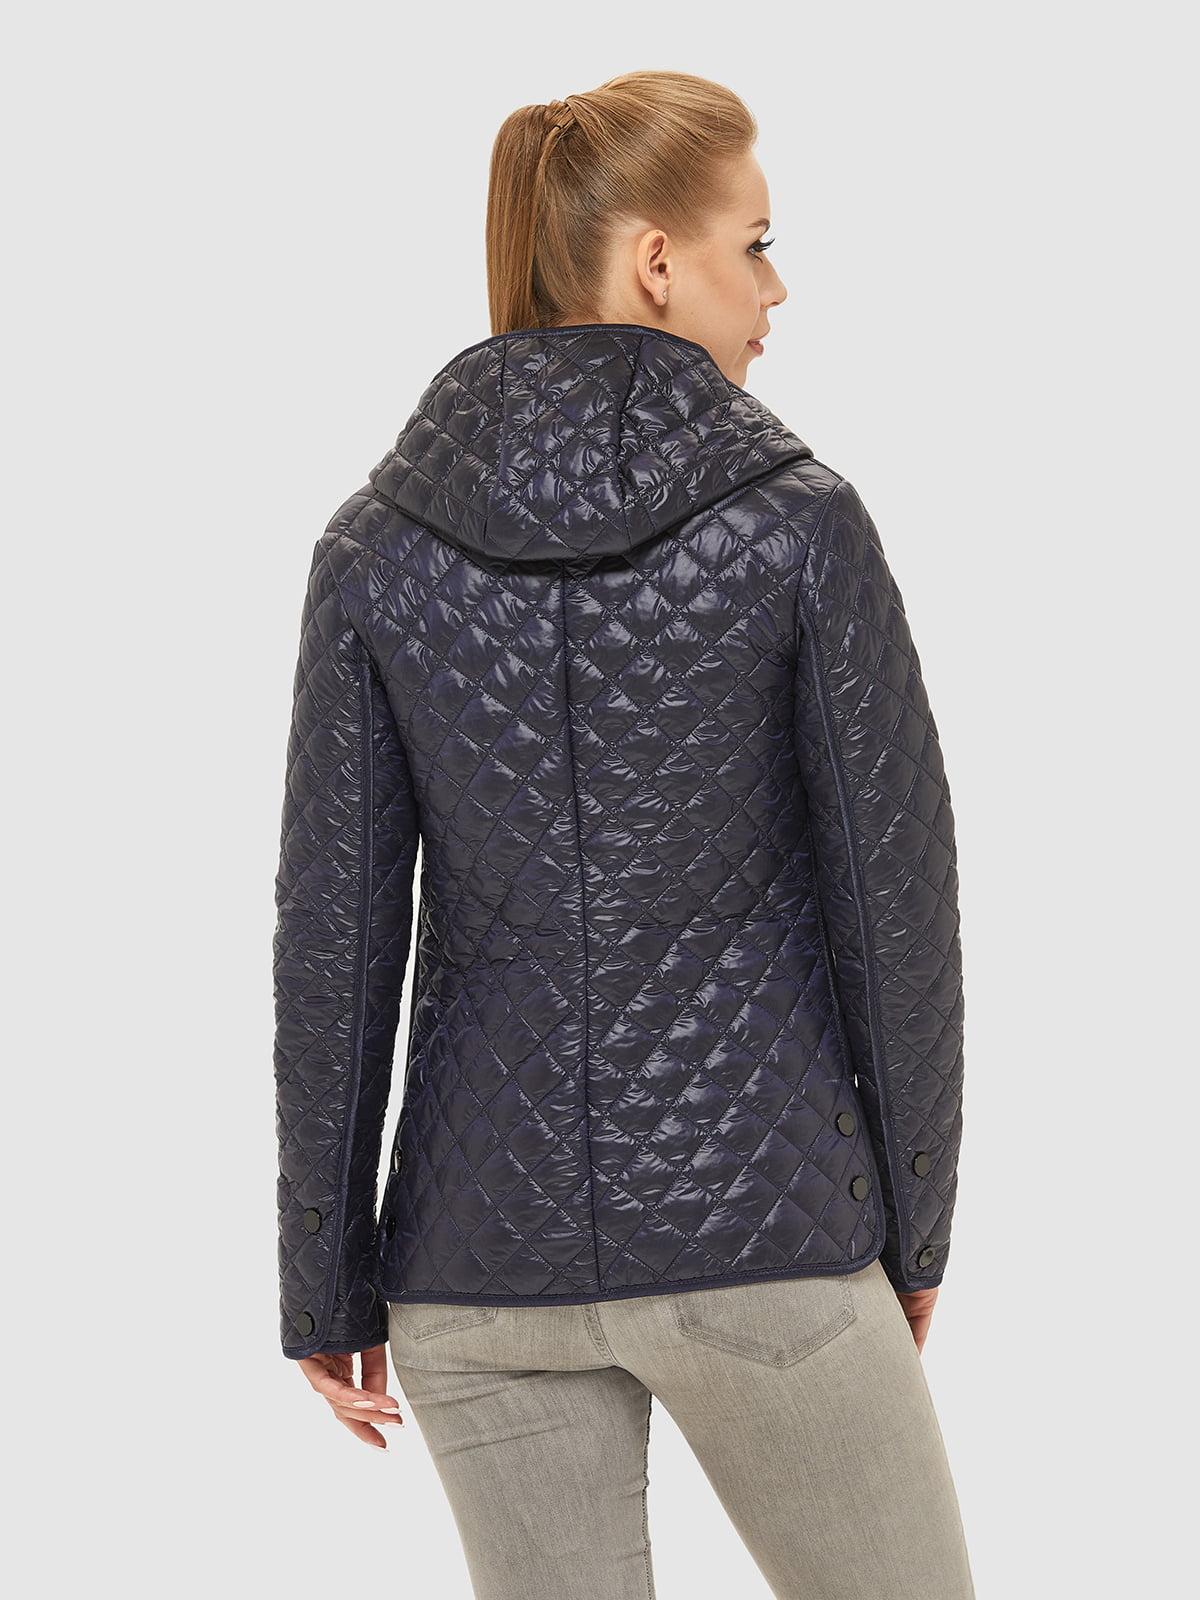 Куртка темно-синя   5075478   фото 2